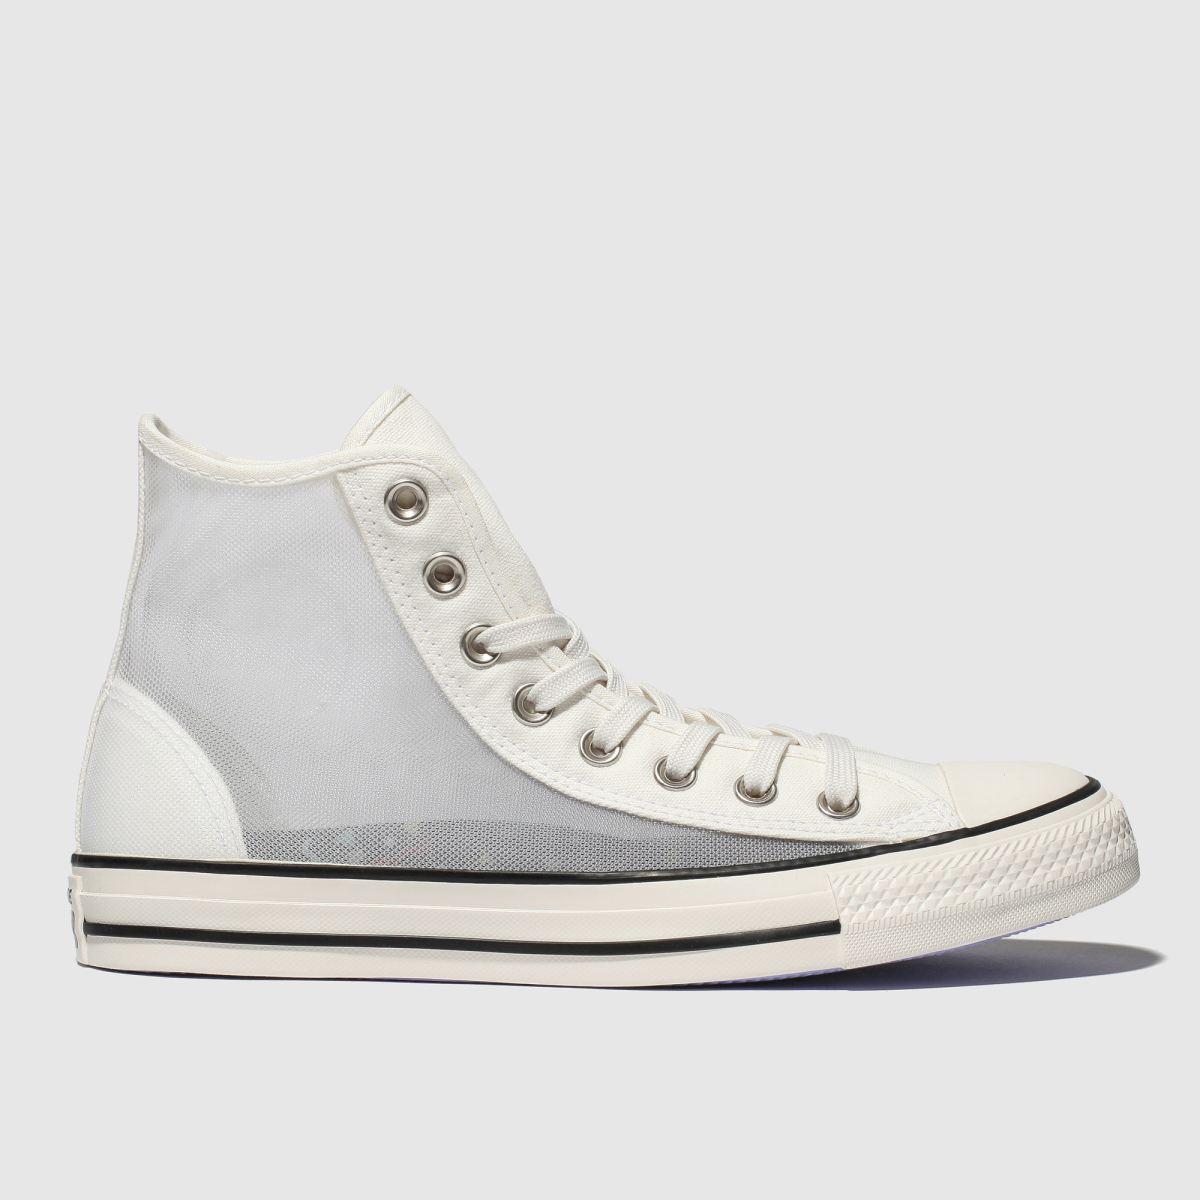 Damen converse Weiß All Star See through Hi Sneaker